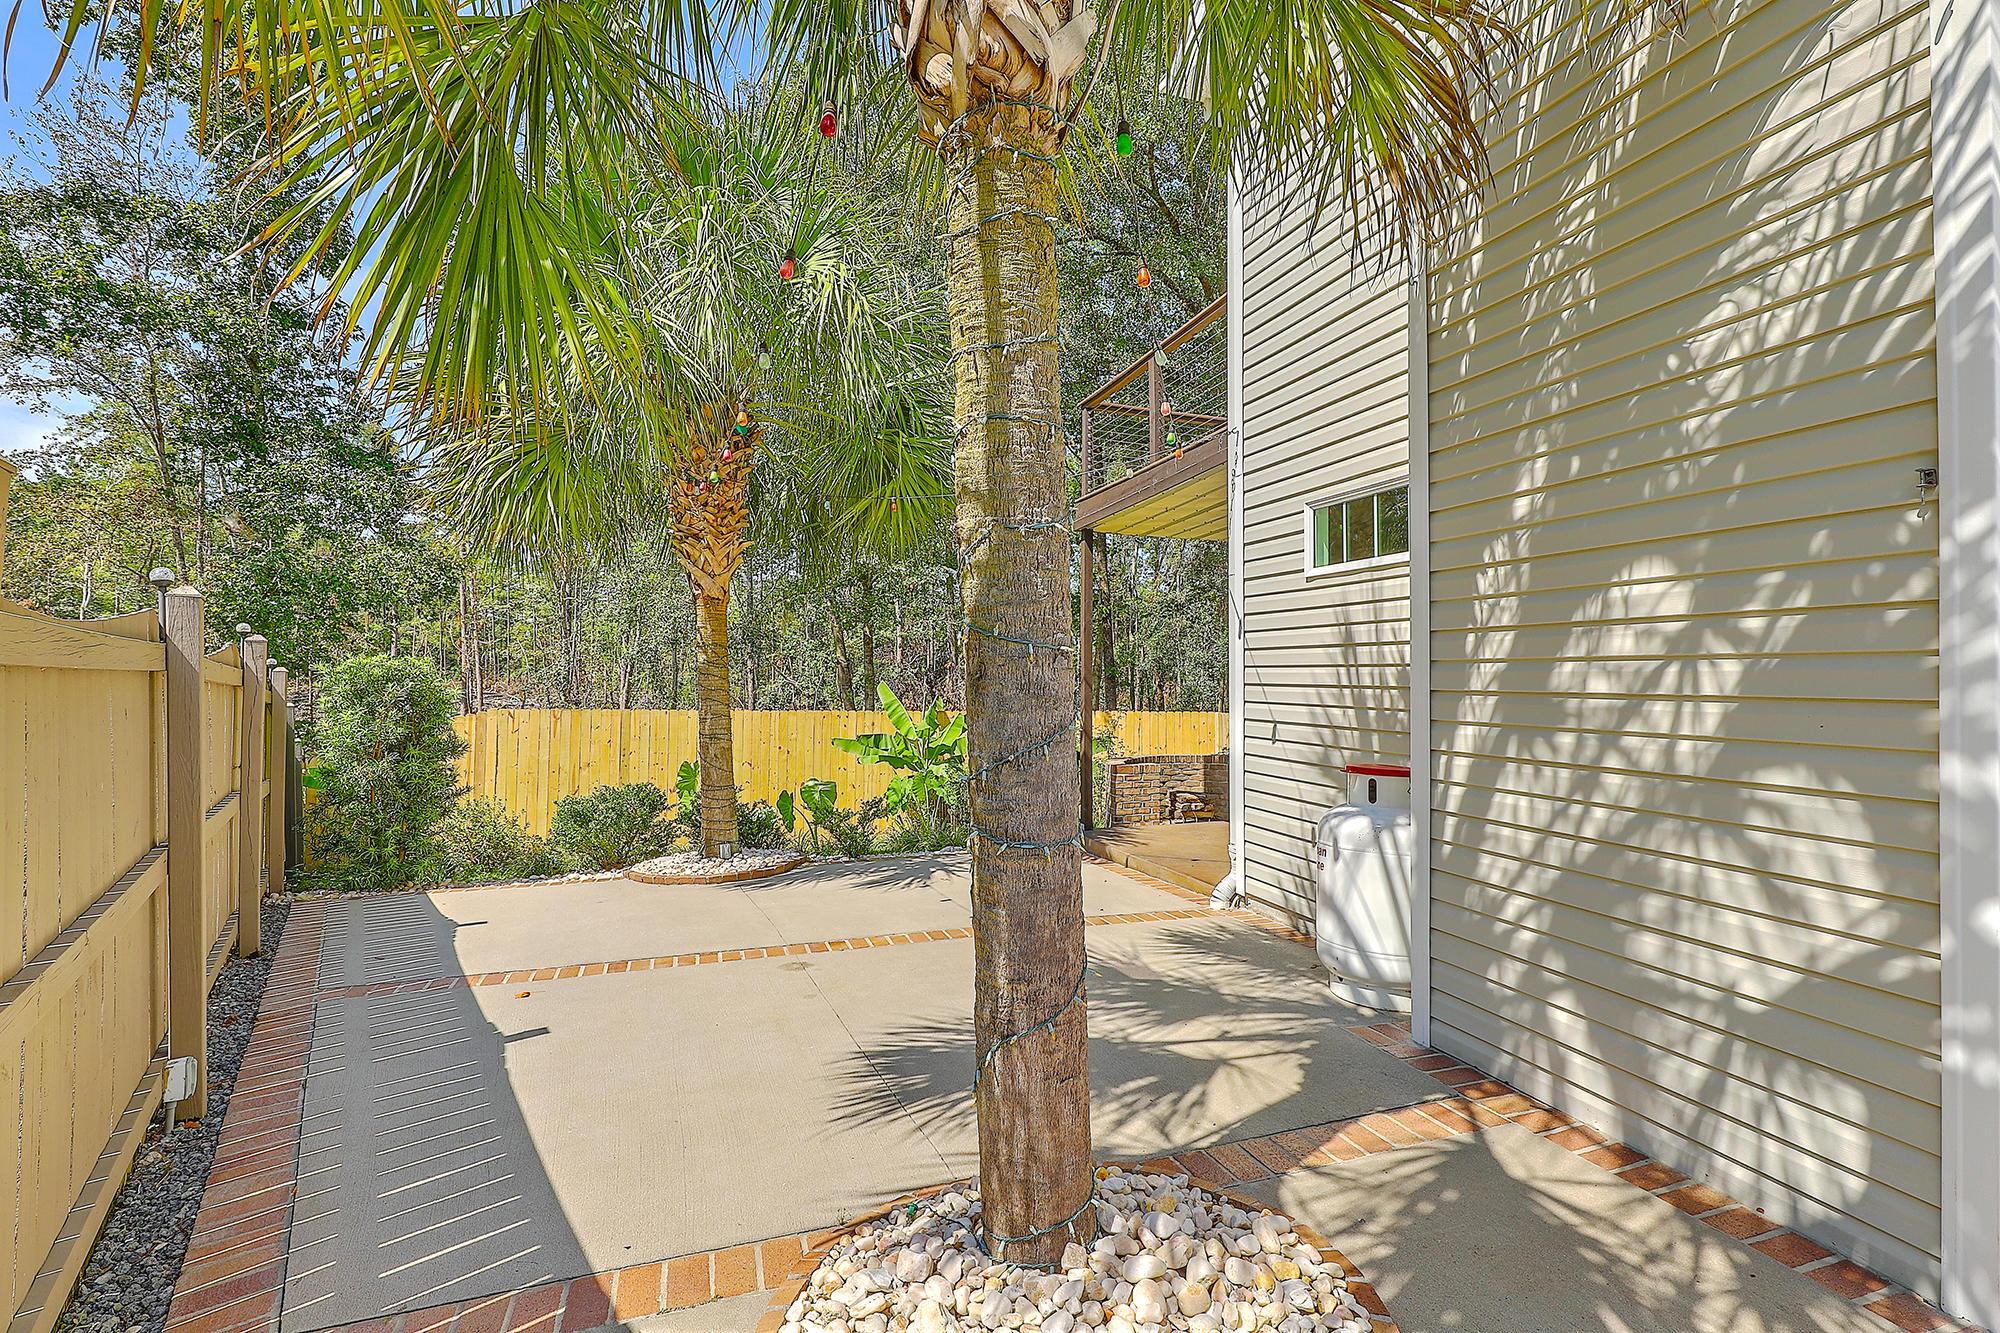 212 Maplewood Ridge Court Summerville, SC 29483